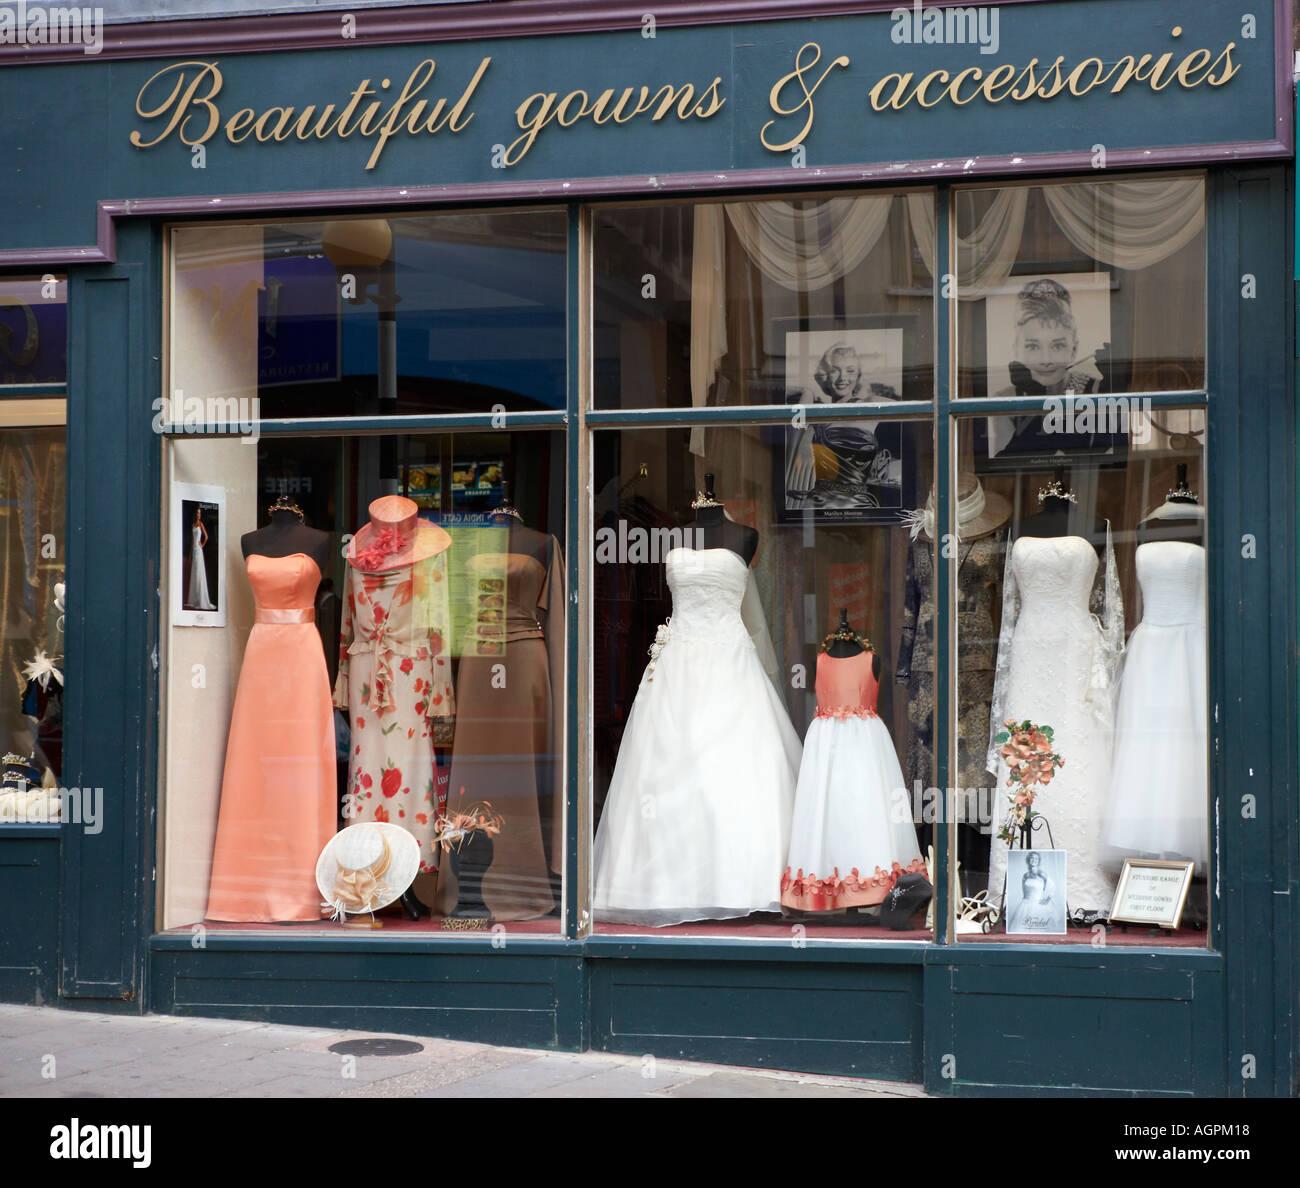 Bridal Shop Window Stock Photos & Bridal Shop Window Stock Images ...